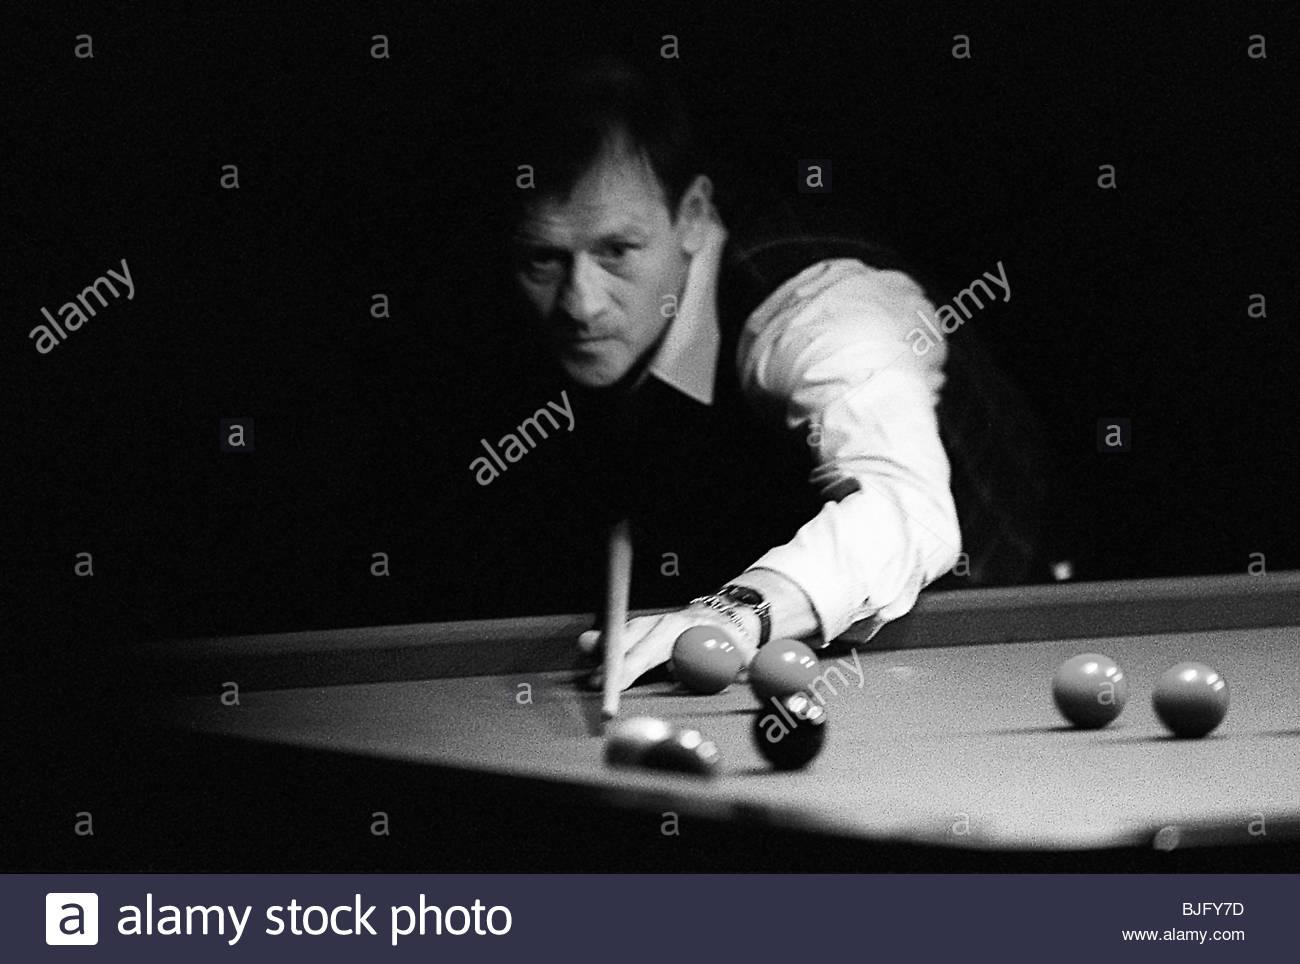 21/06/95 EXHIBITION MATCH John HIGGINS (SCO) v Alex HIGGINS (NIRE) WISHAW SPORTS CENTRE Northern Ireland's Alex - Stock Image